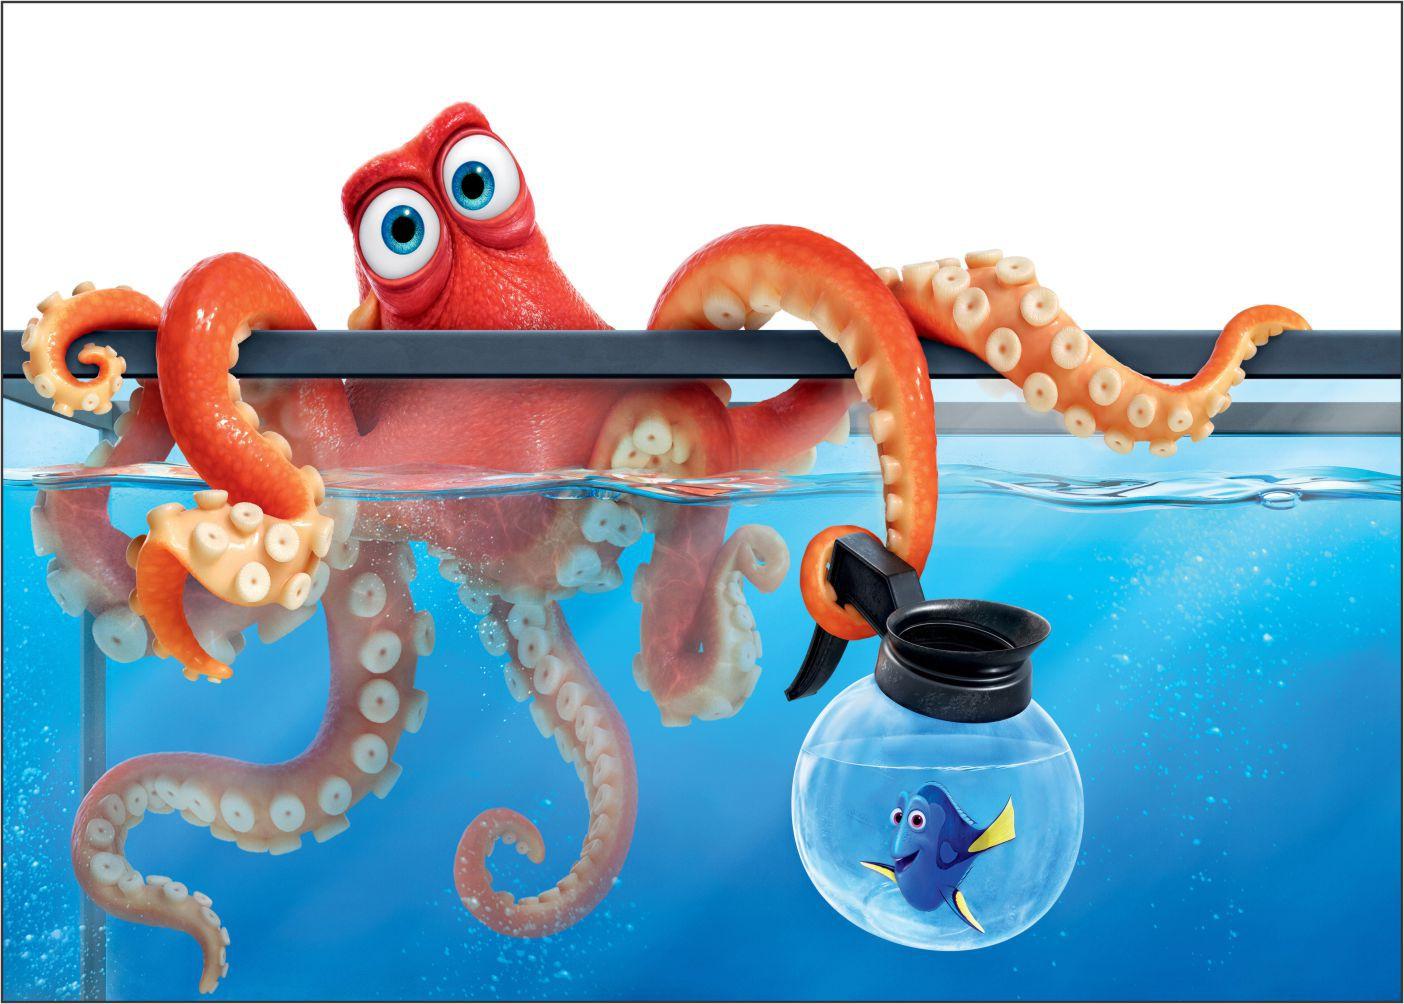 Papel de Parede 3D Nemo 0002 - Adesivos de Parede  - Paredes Decoradas